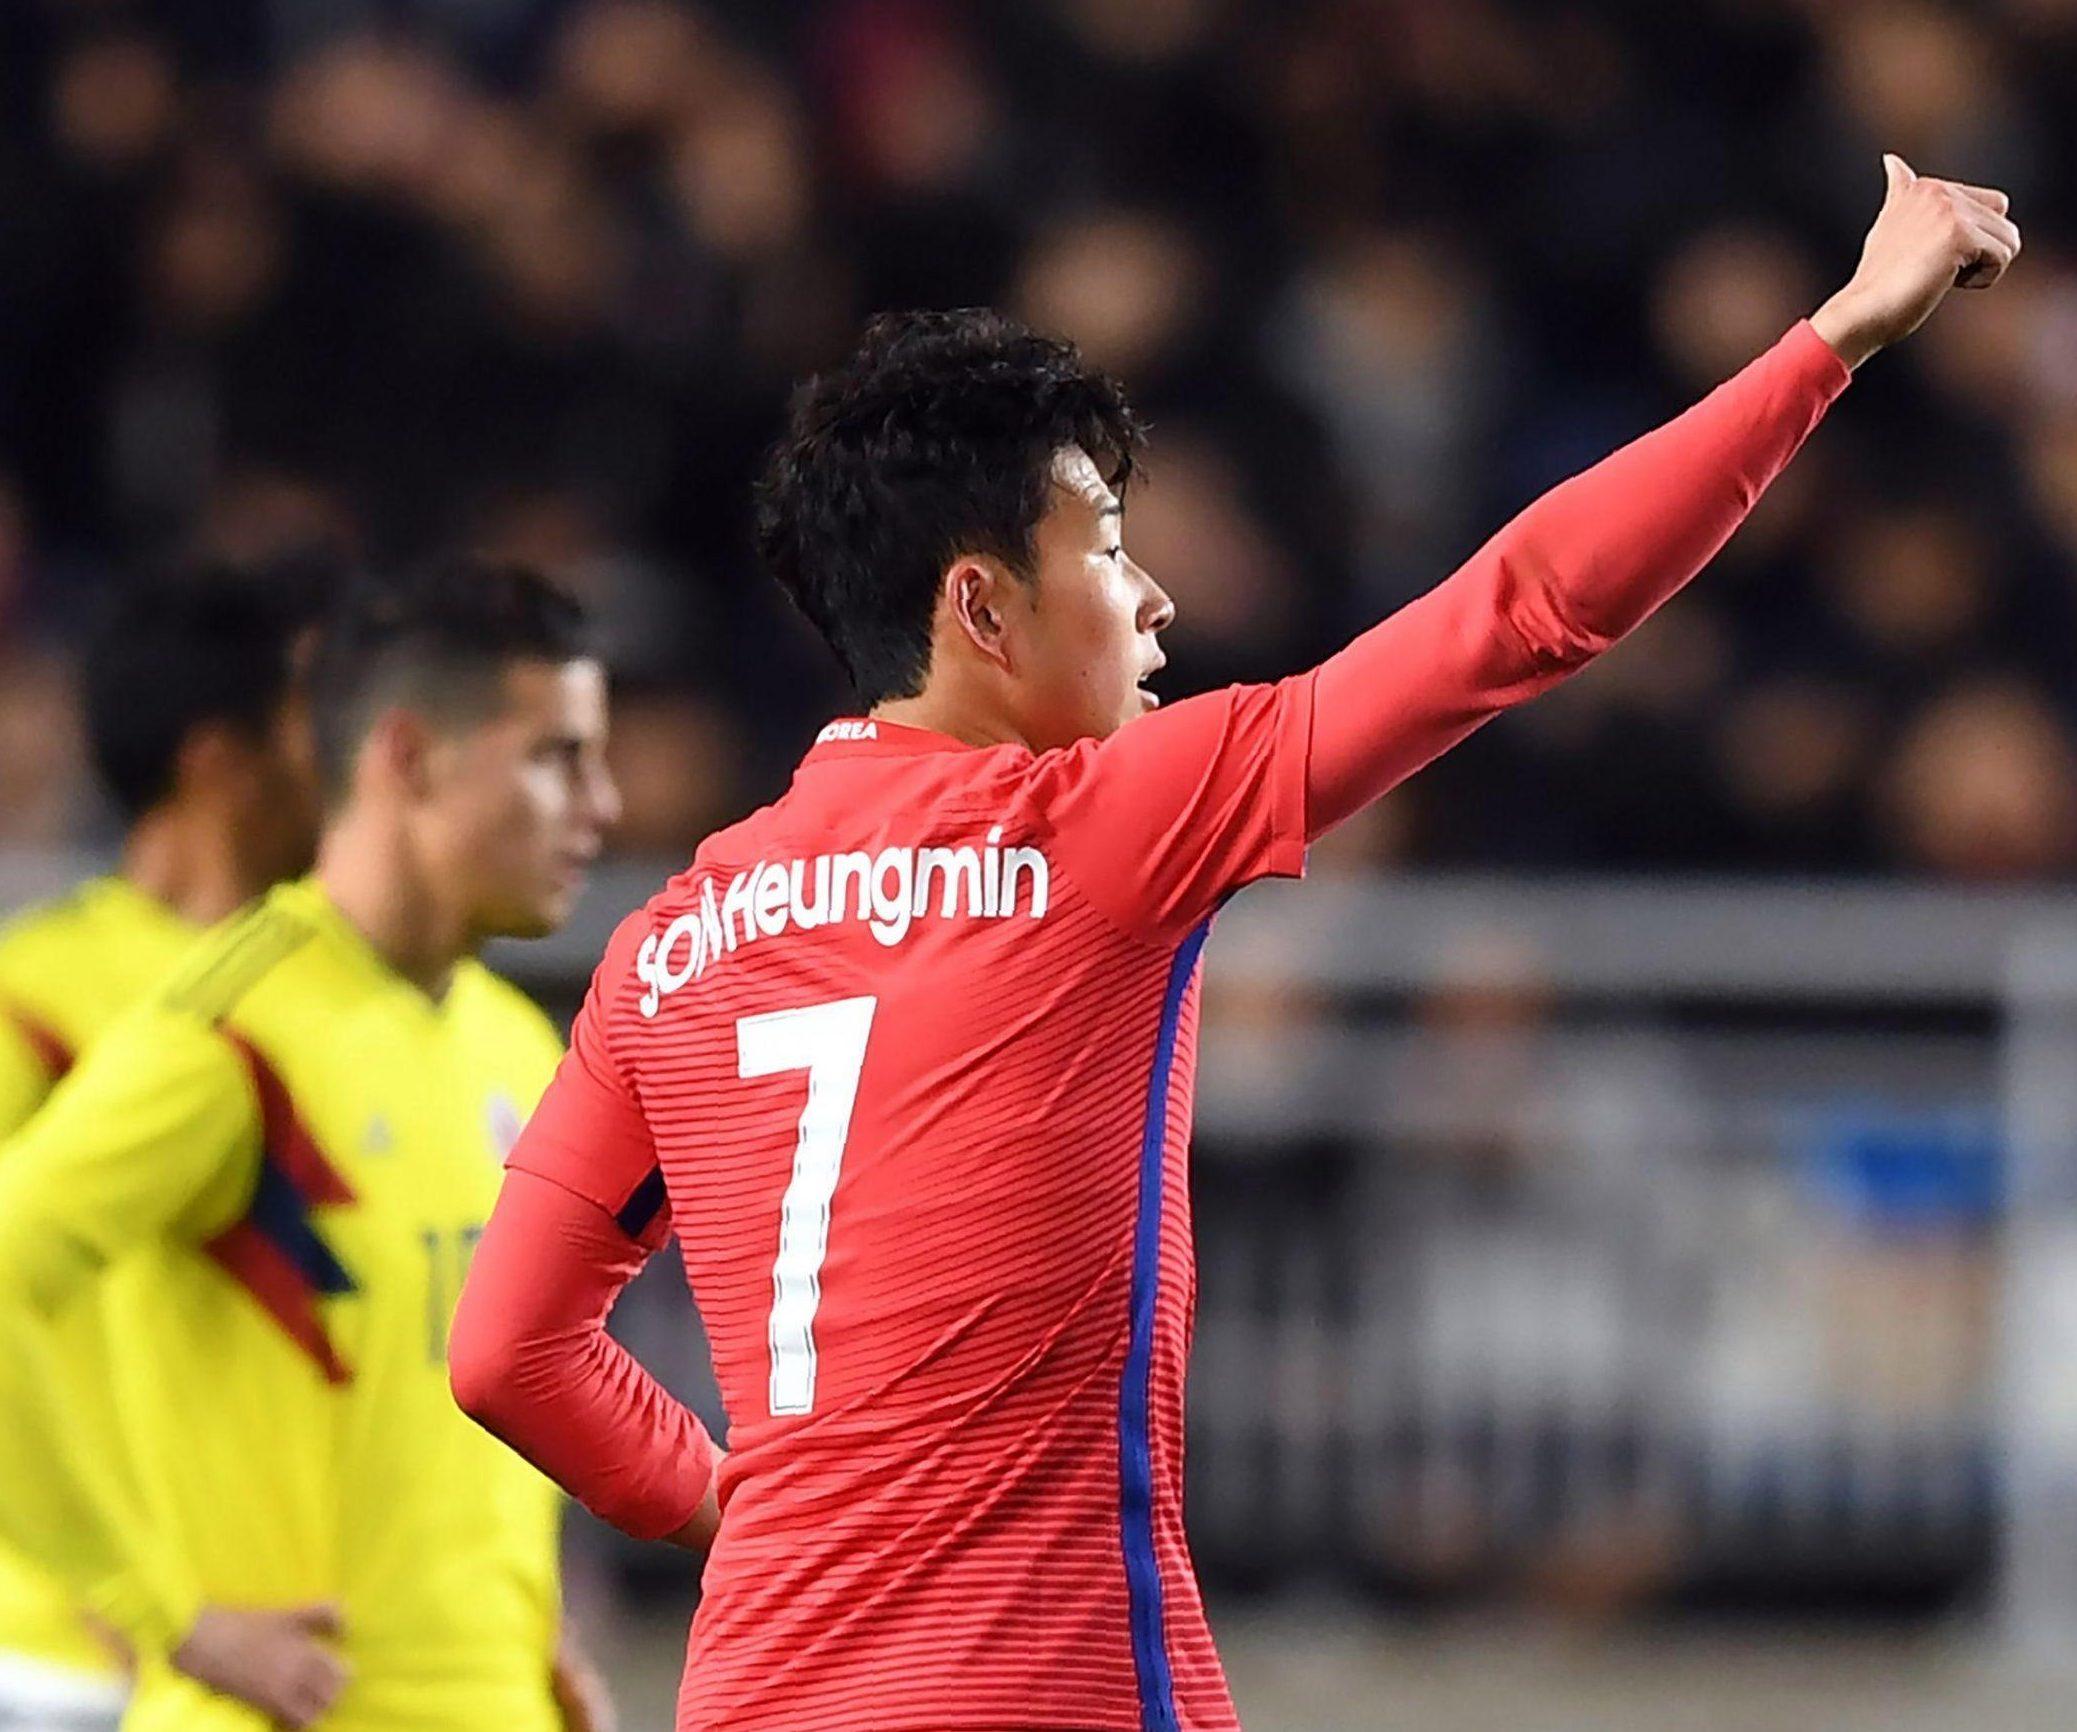 Son Heung-Min will put Poland and Senegal through their paces